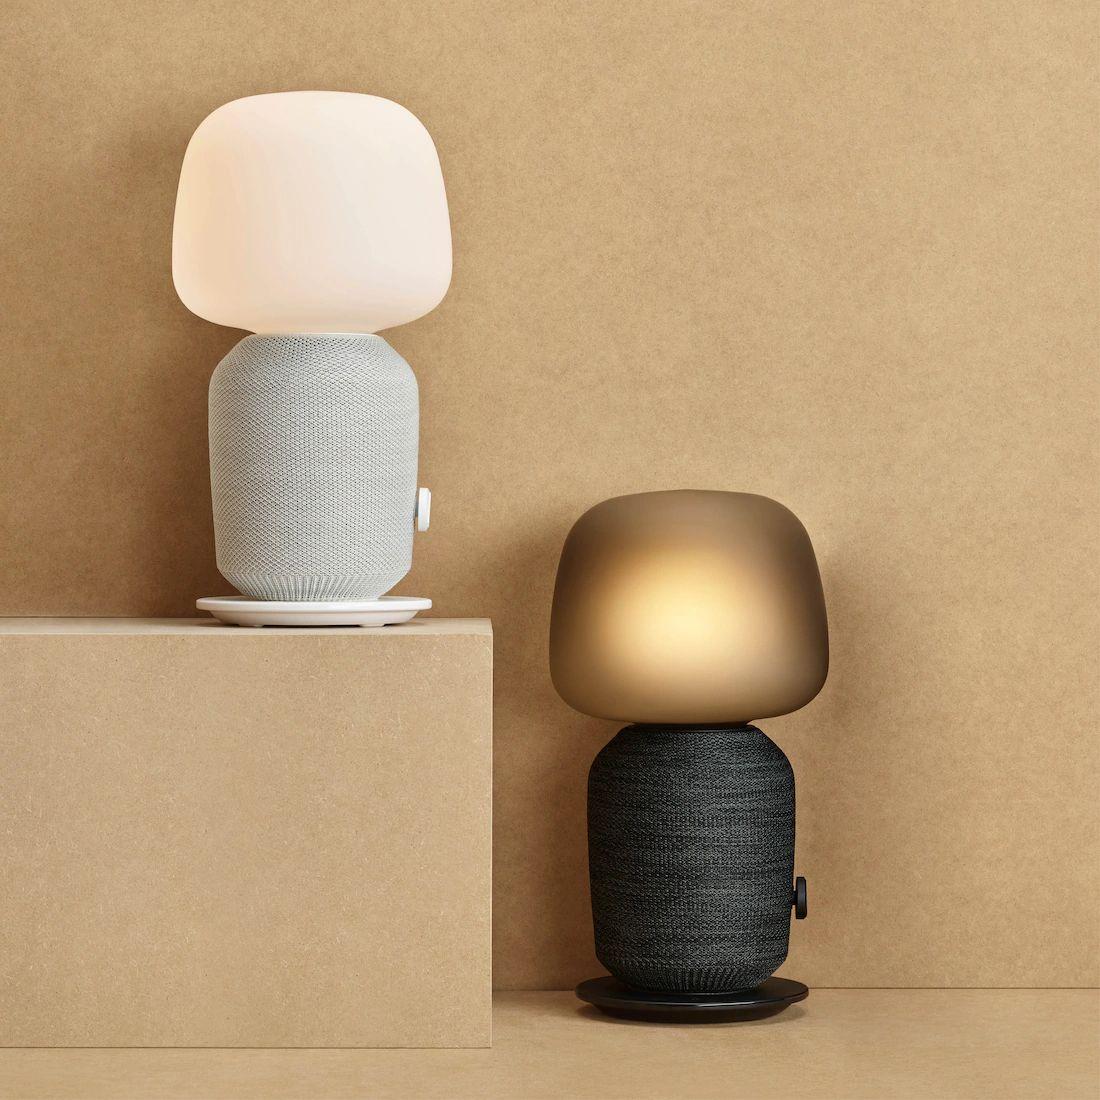 Ikea: Tischleuchte/Wifi-Speaker Symfonisk